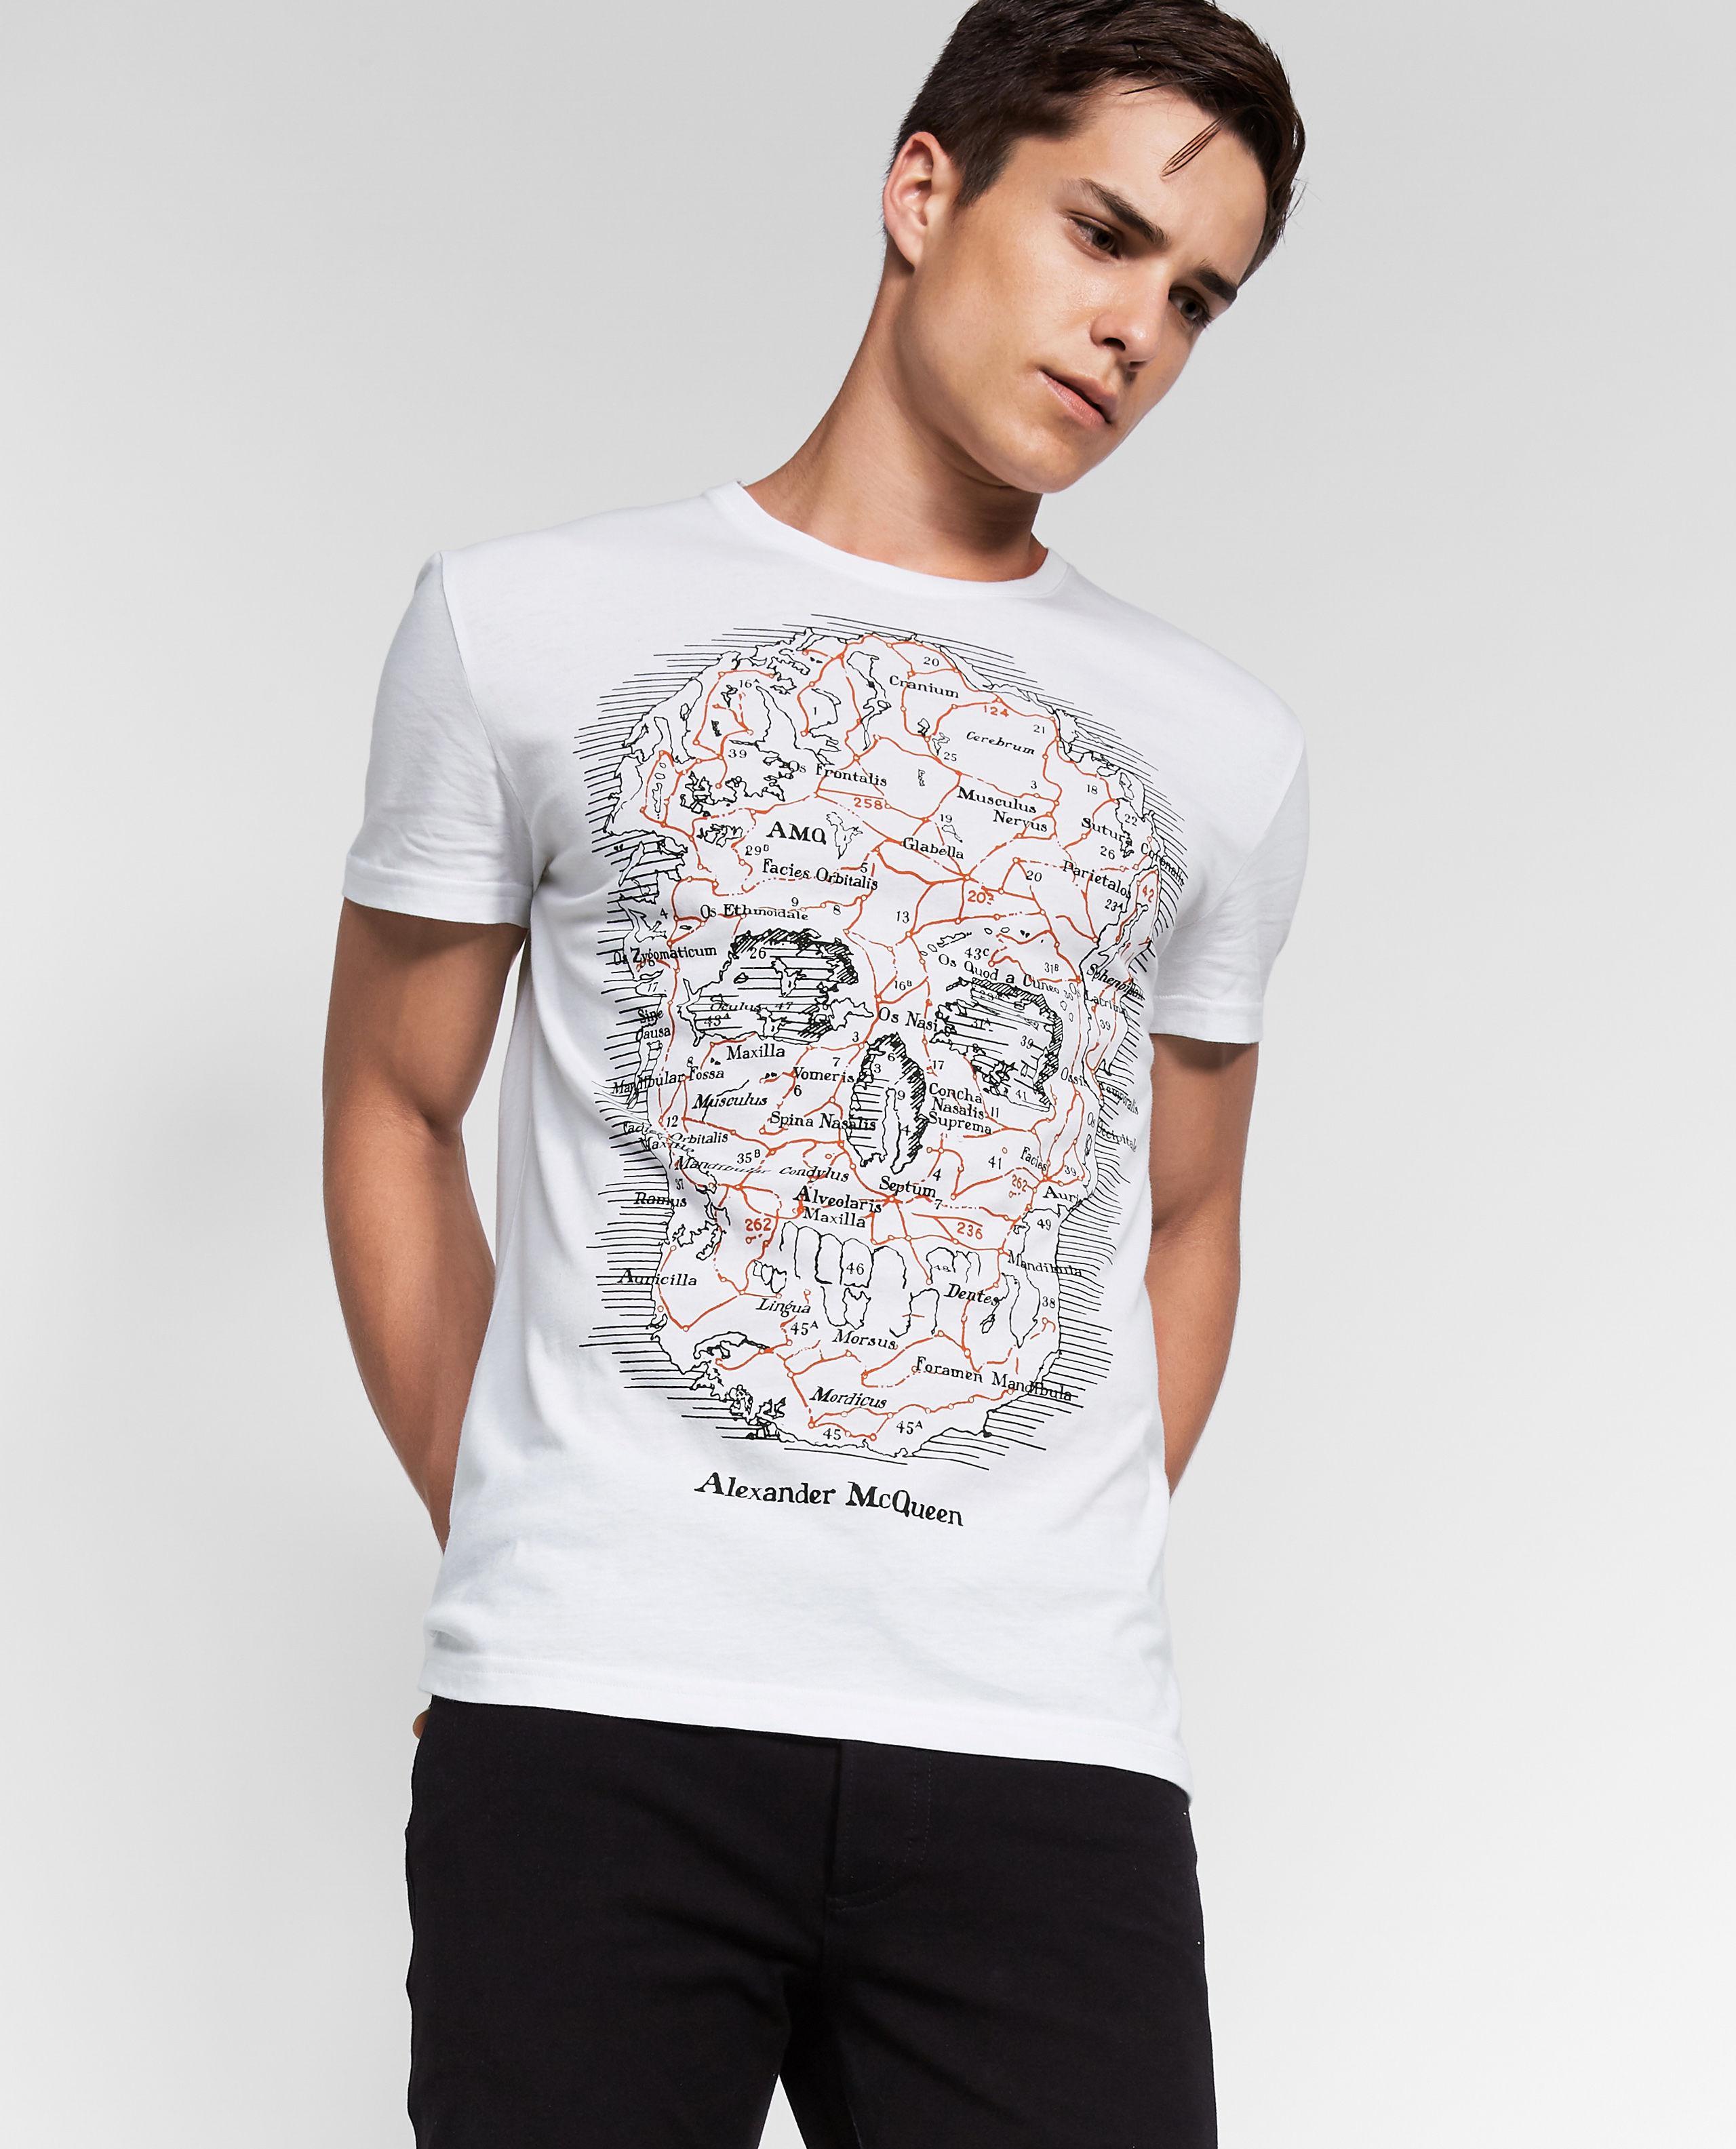 92ea2014 Alexander McQueen - White T-shirt for Men - Lyst. View fullscreen